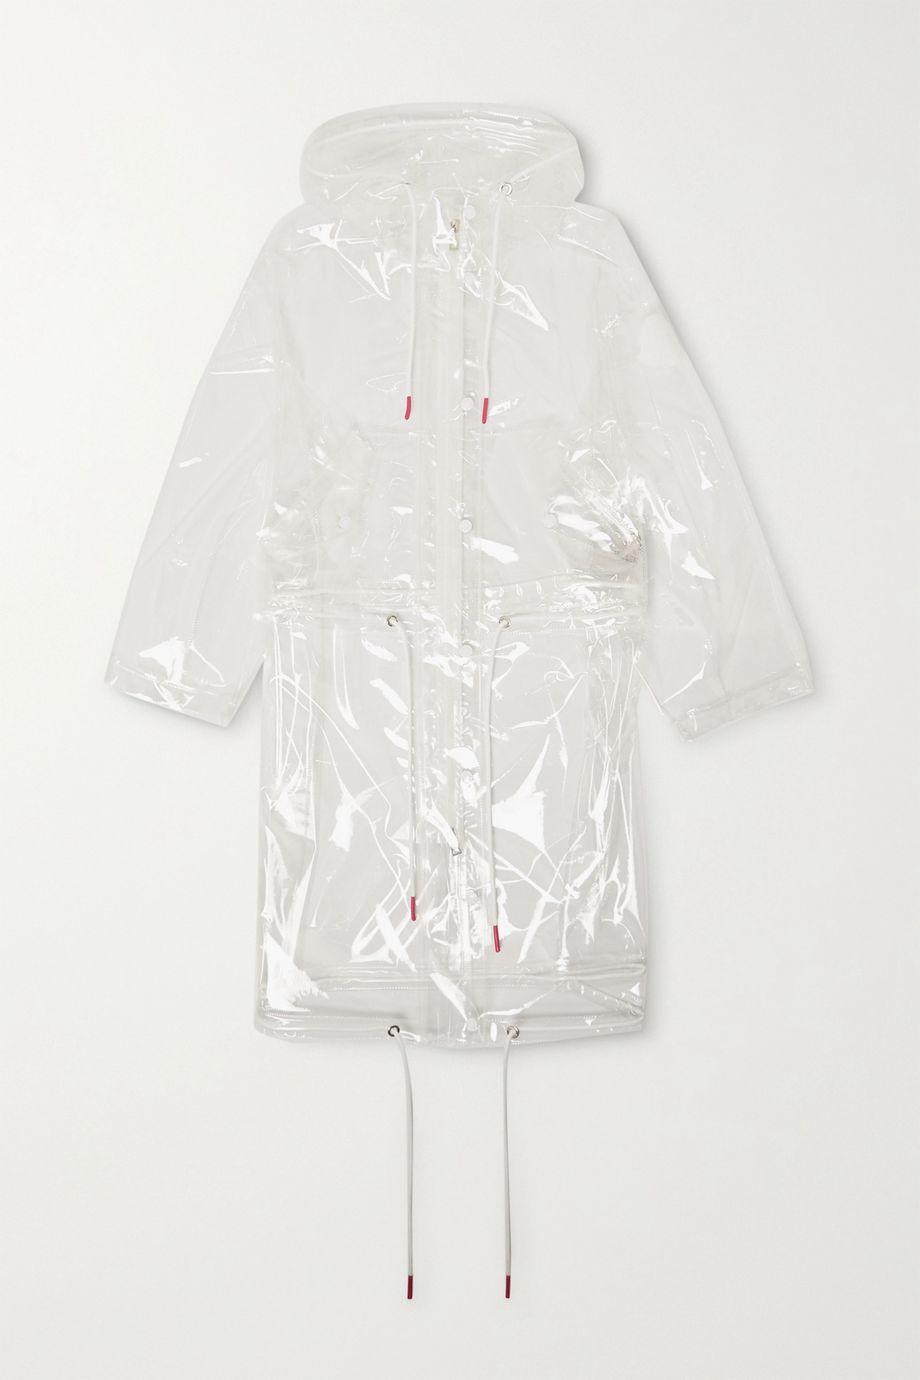 Moncler Acajou PU raincoat